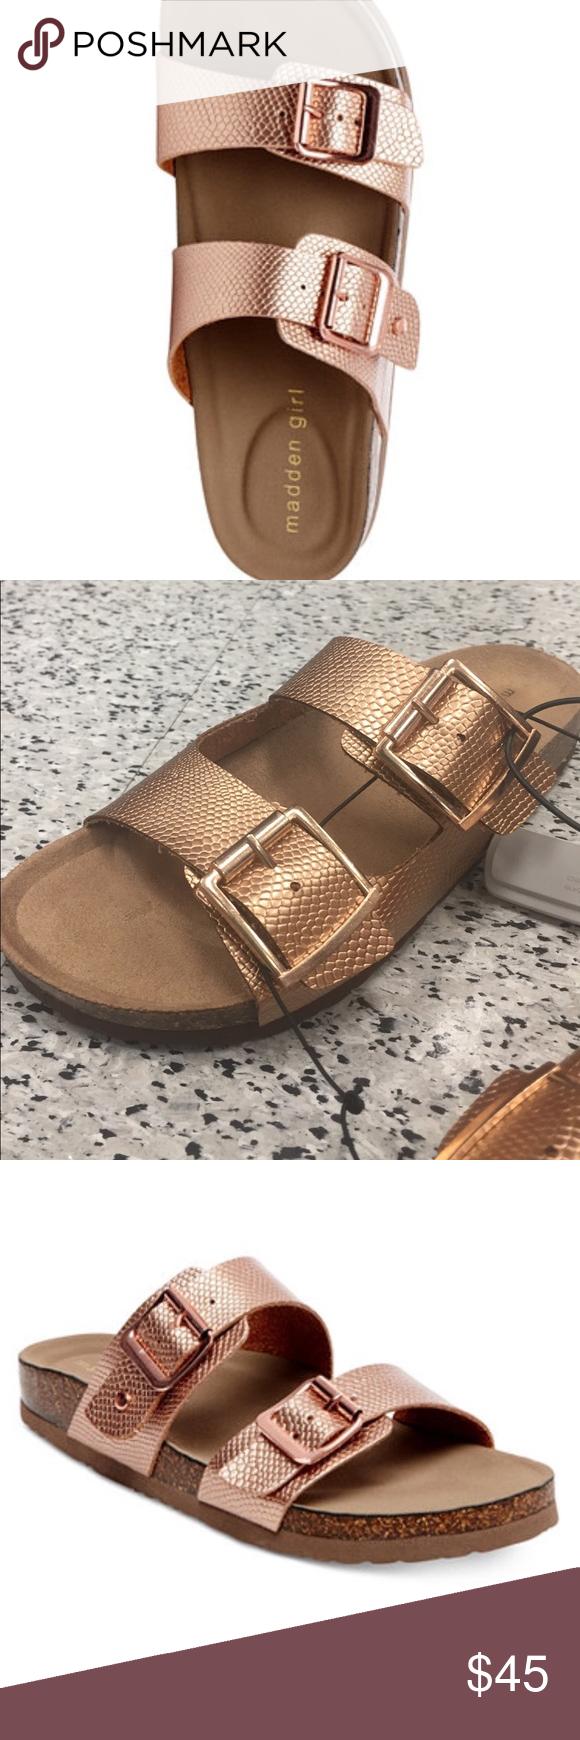 118bf71d4da Madden Girl Rose Gold knockoff Birkenstocks Brand new with tags Birkenstock  Shoes Sandals